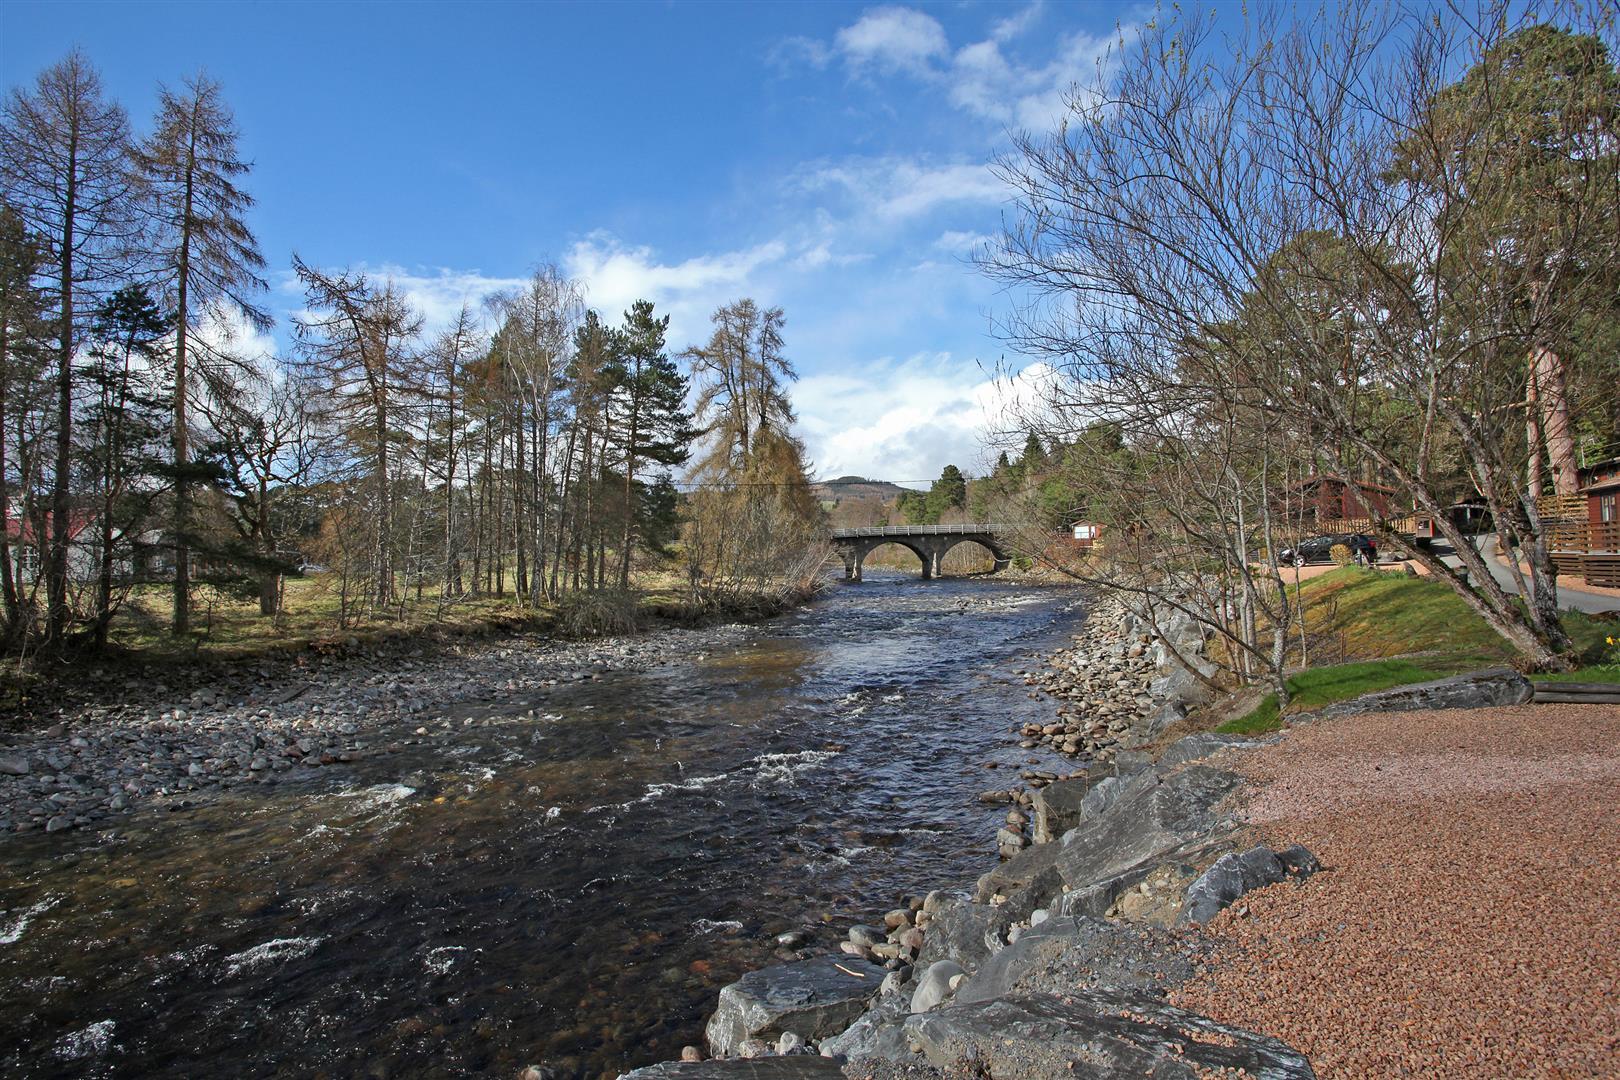 Mallard Lodge Lot 9, River Tilt Caravan Park, Invertilt Road, Blair Atholl, Pitlochry, Perthshire, PH18 5TE, UK